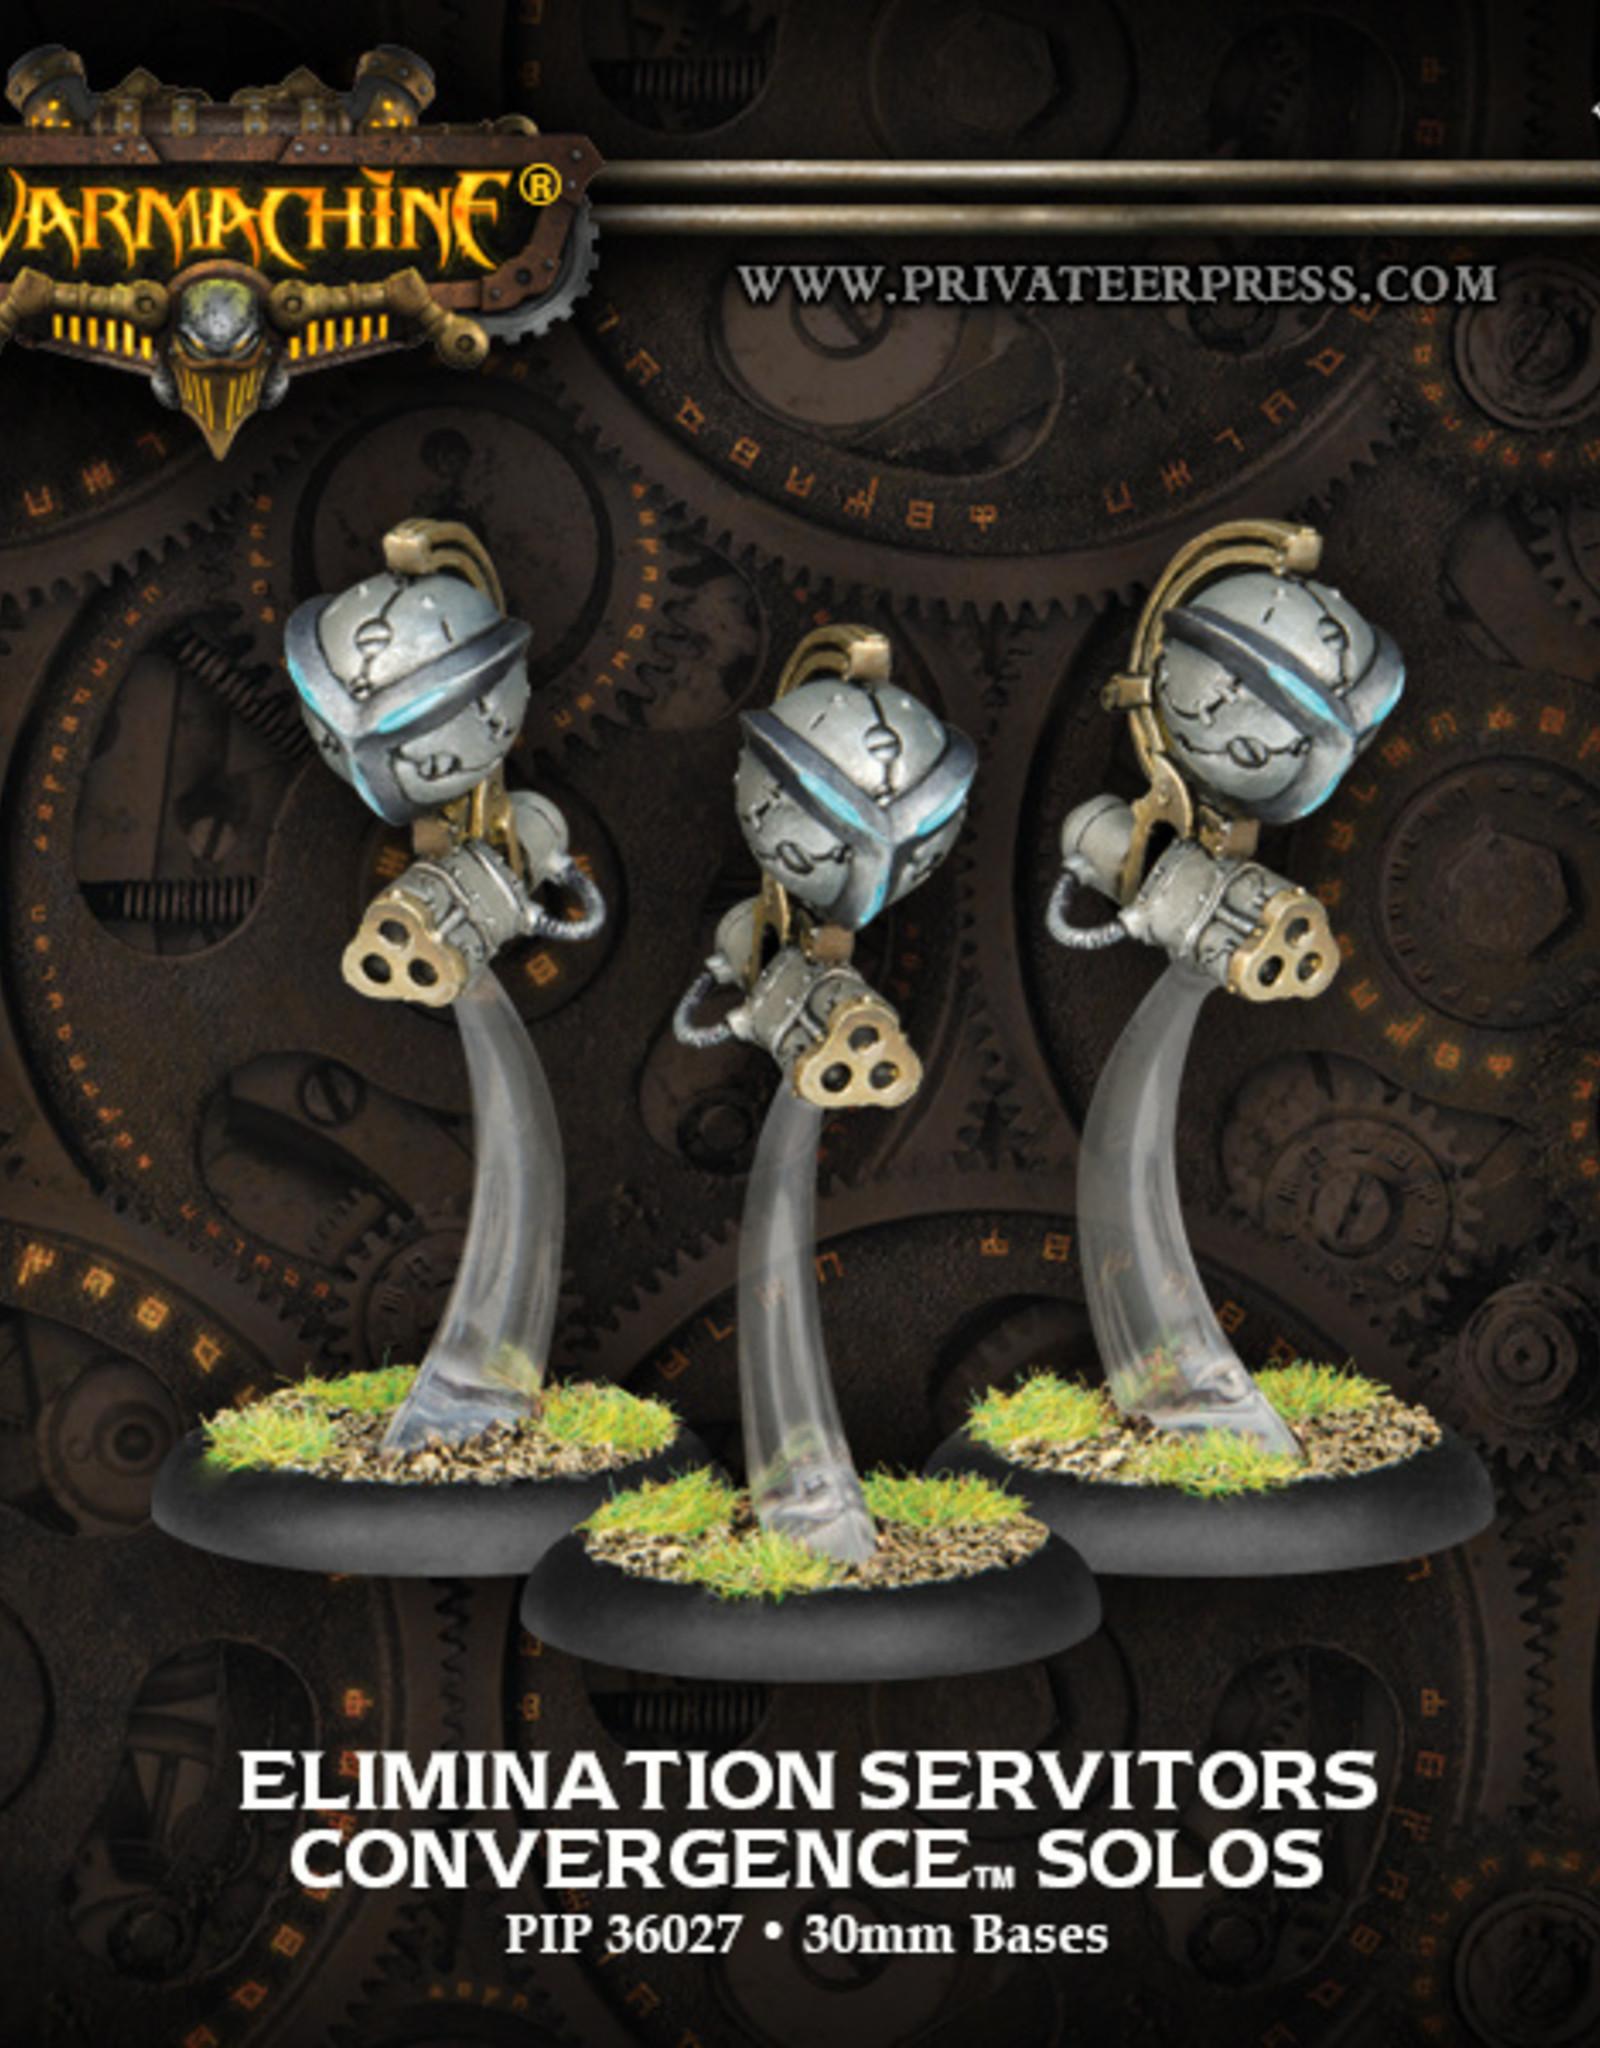 Privateer Press Elimination Servitors